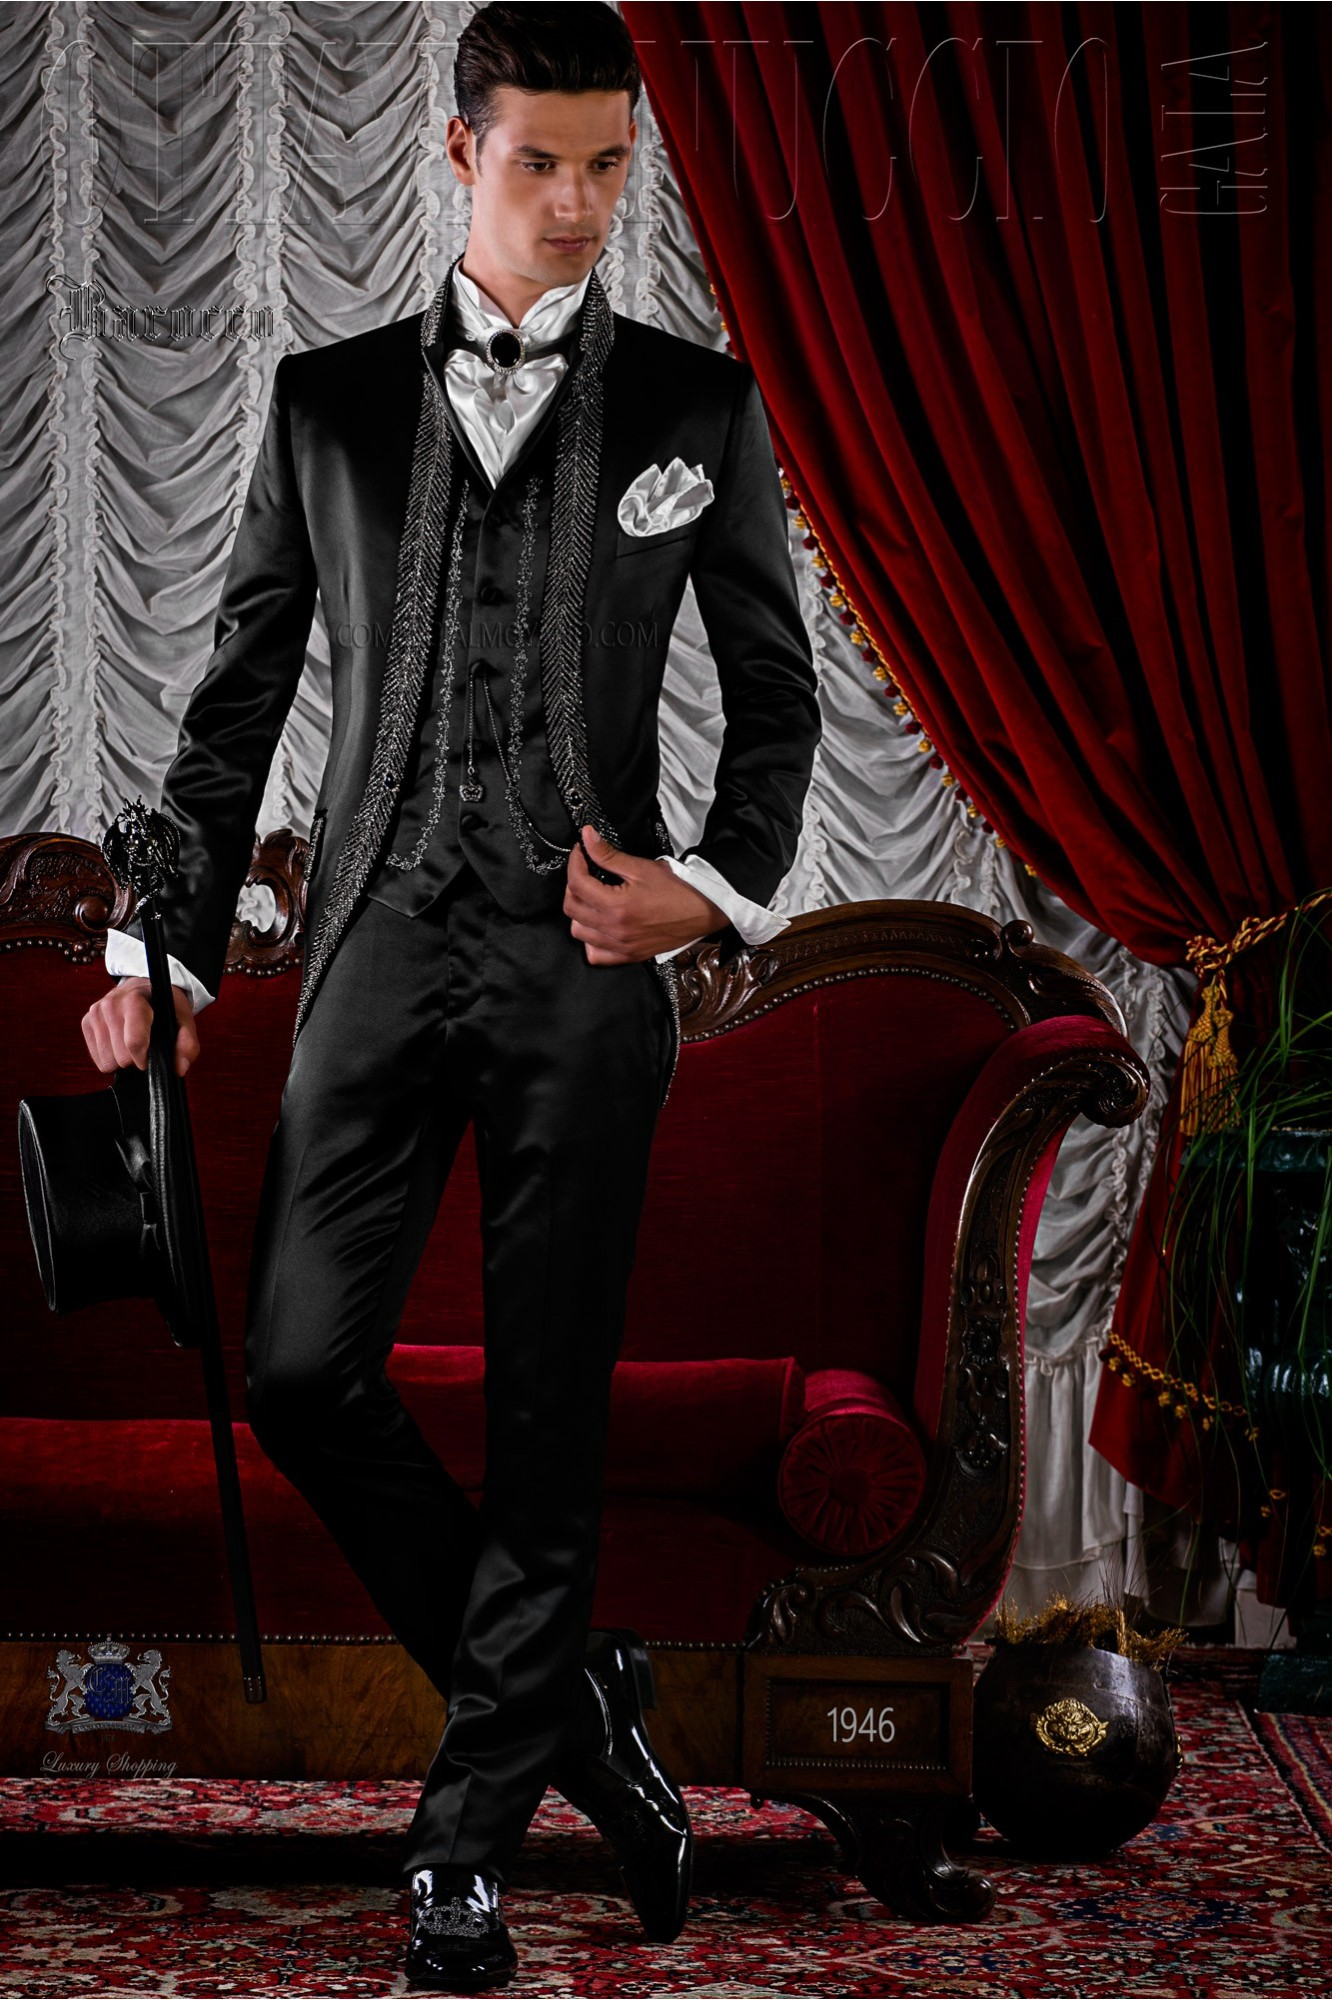 Traje de novio de época modelo redingote negro con pedrería